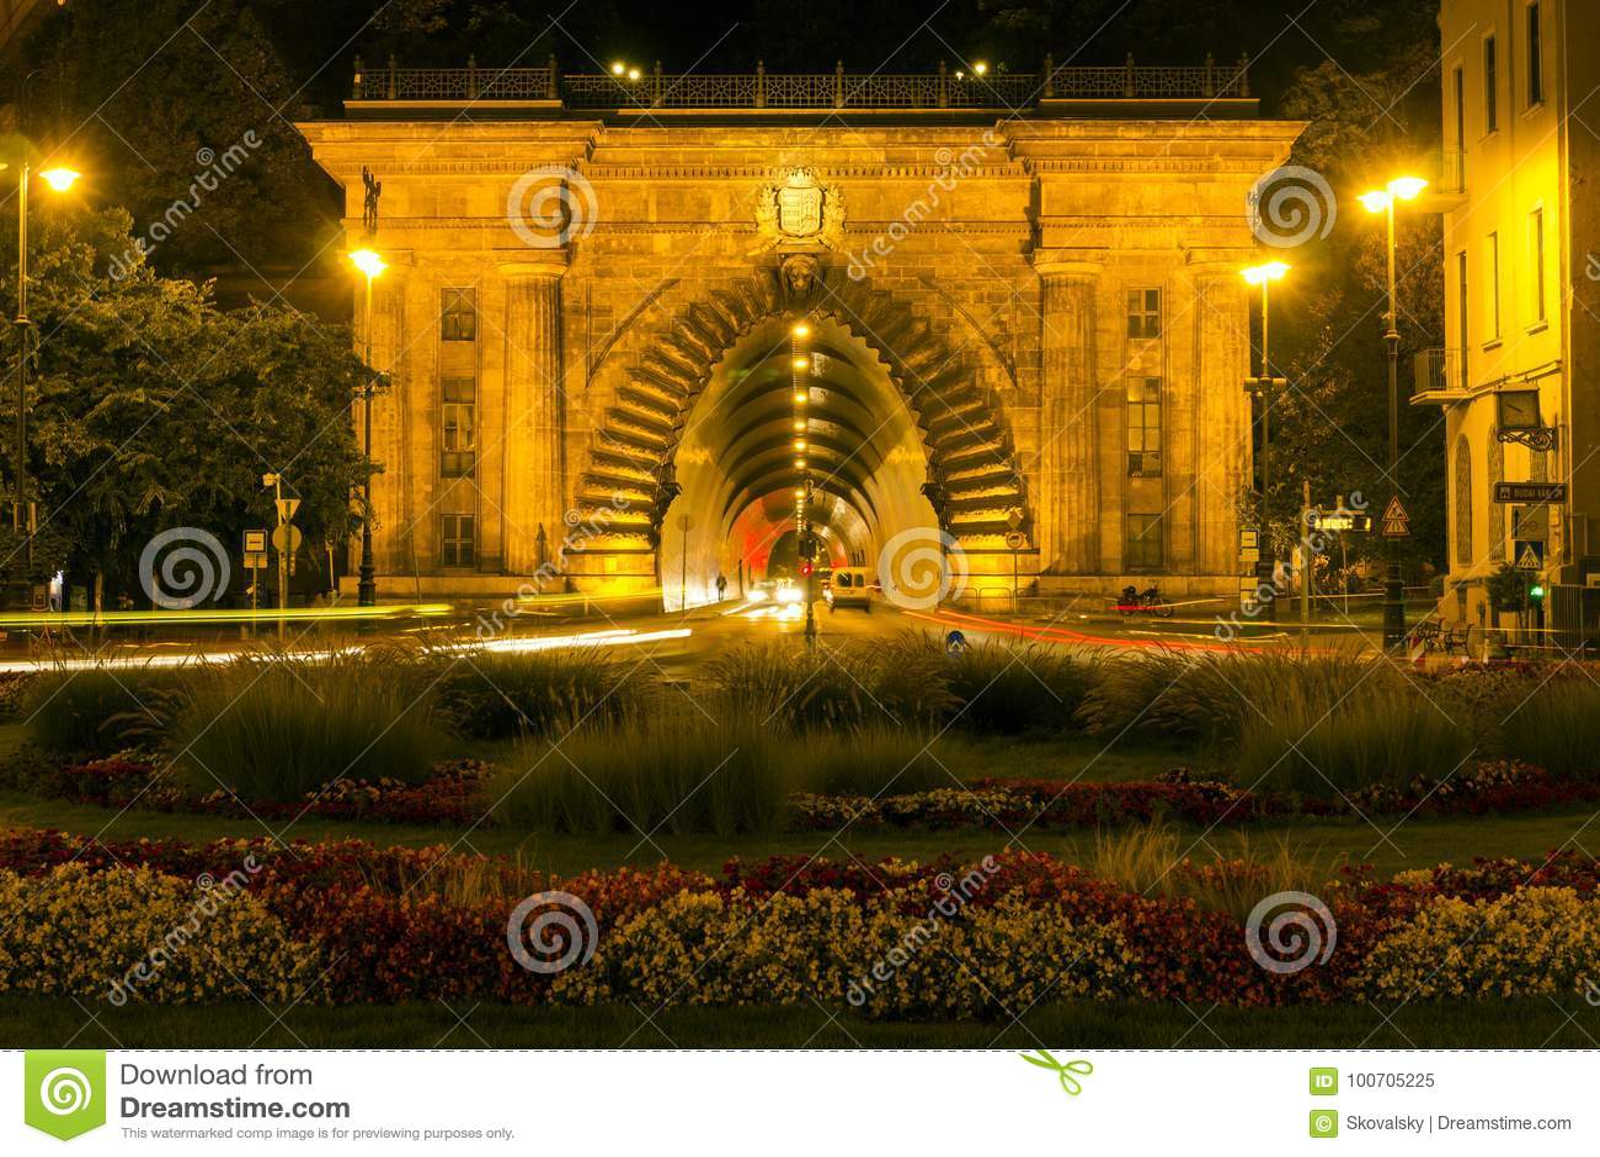 Buda castle tunnel in Budapest